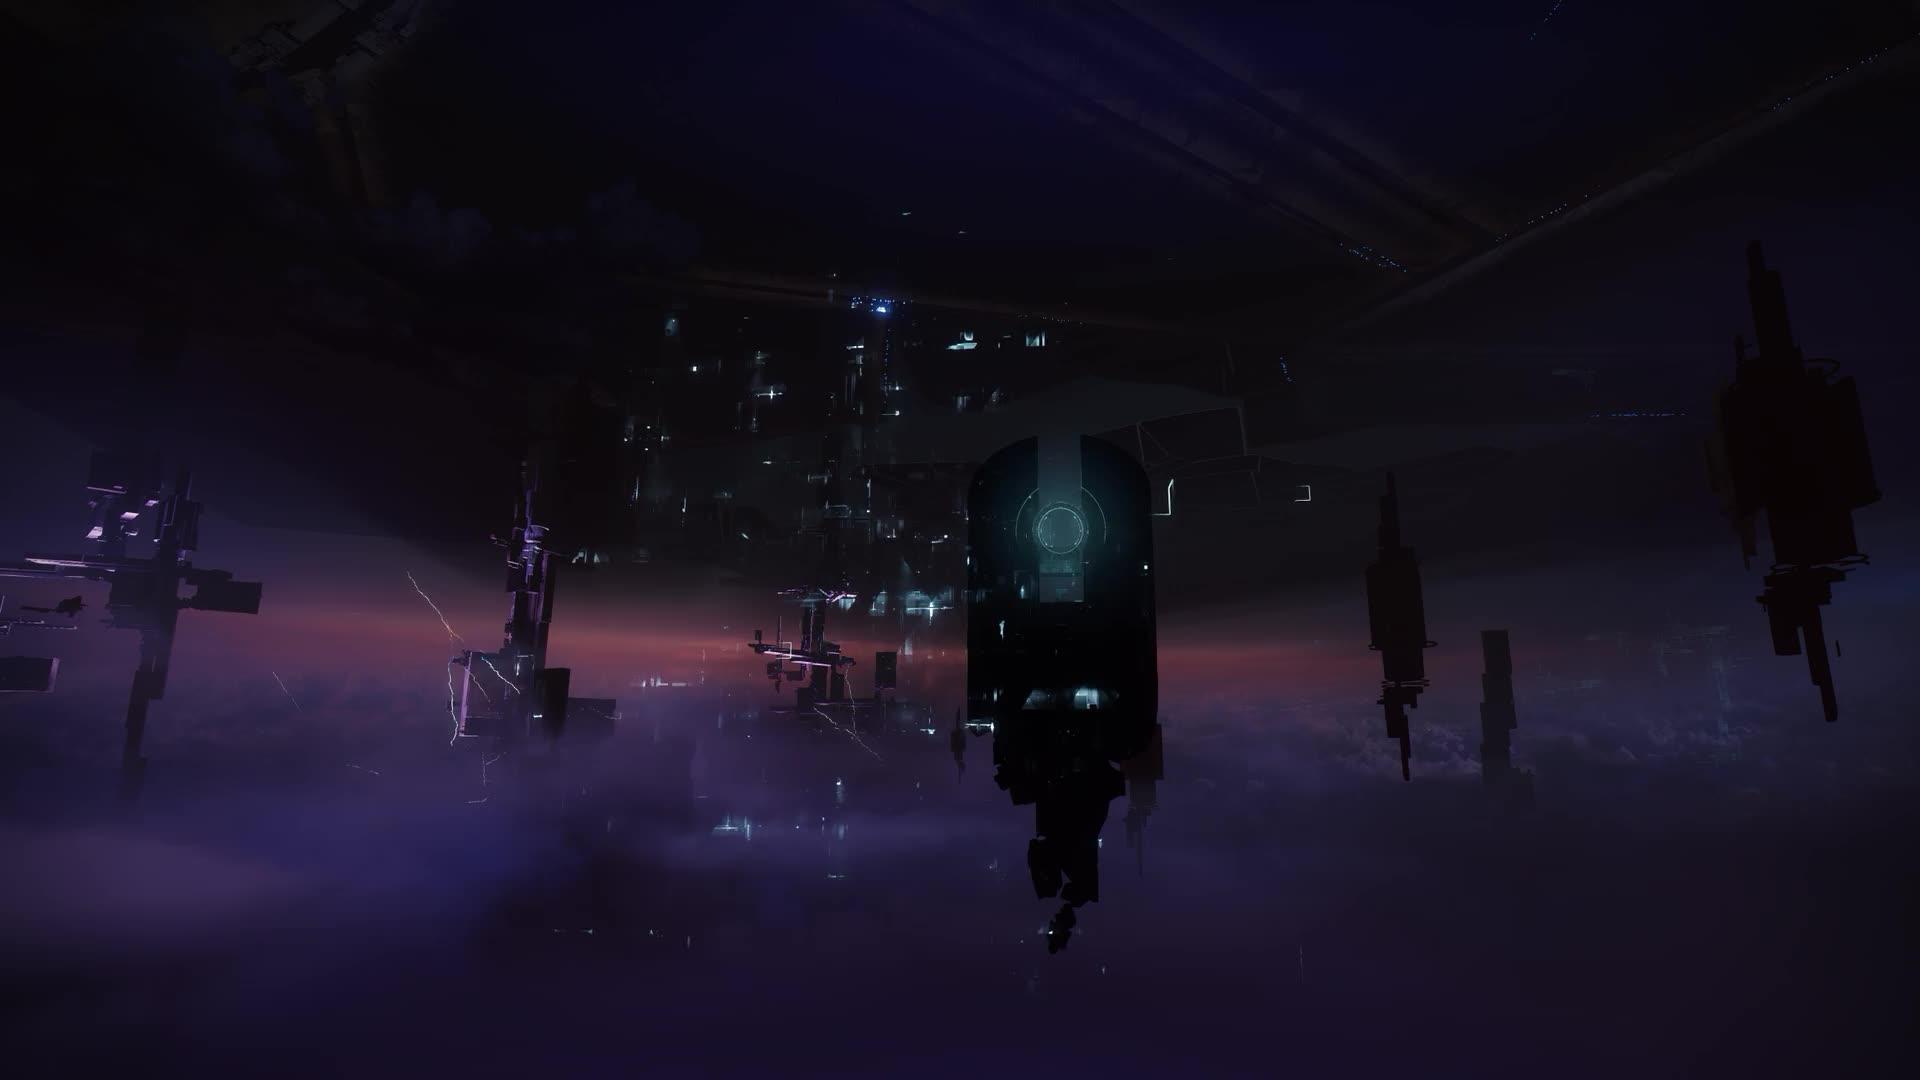 Destiny 2 Haunted Forest - живые обои